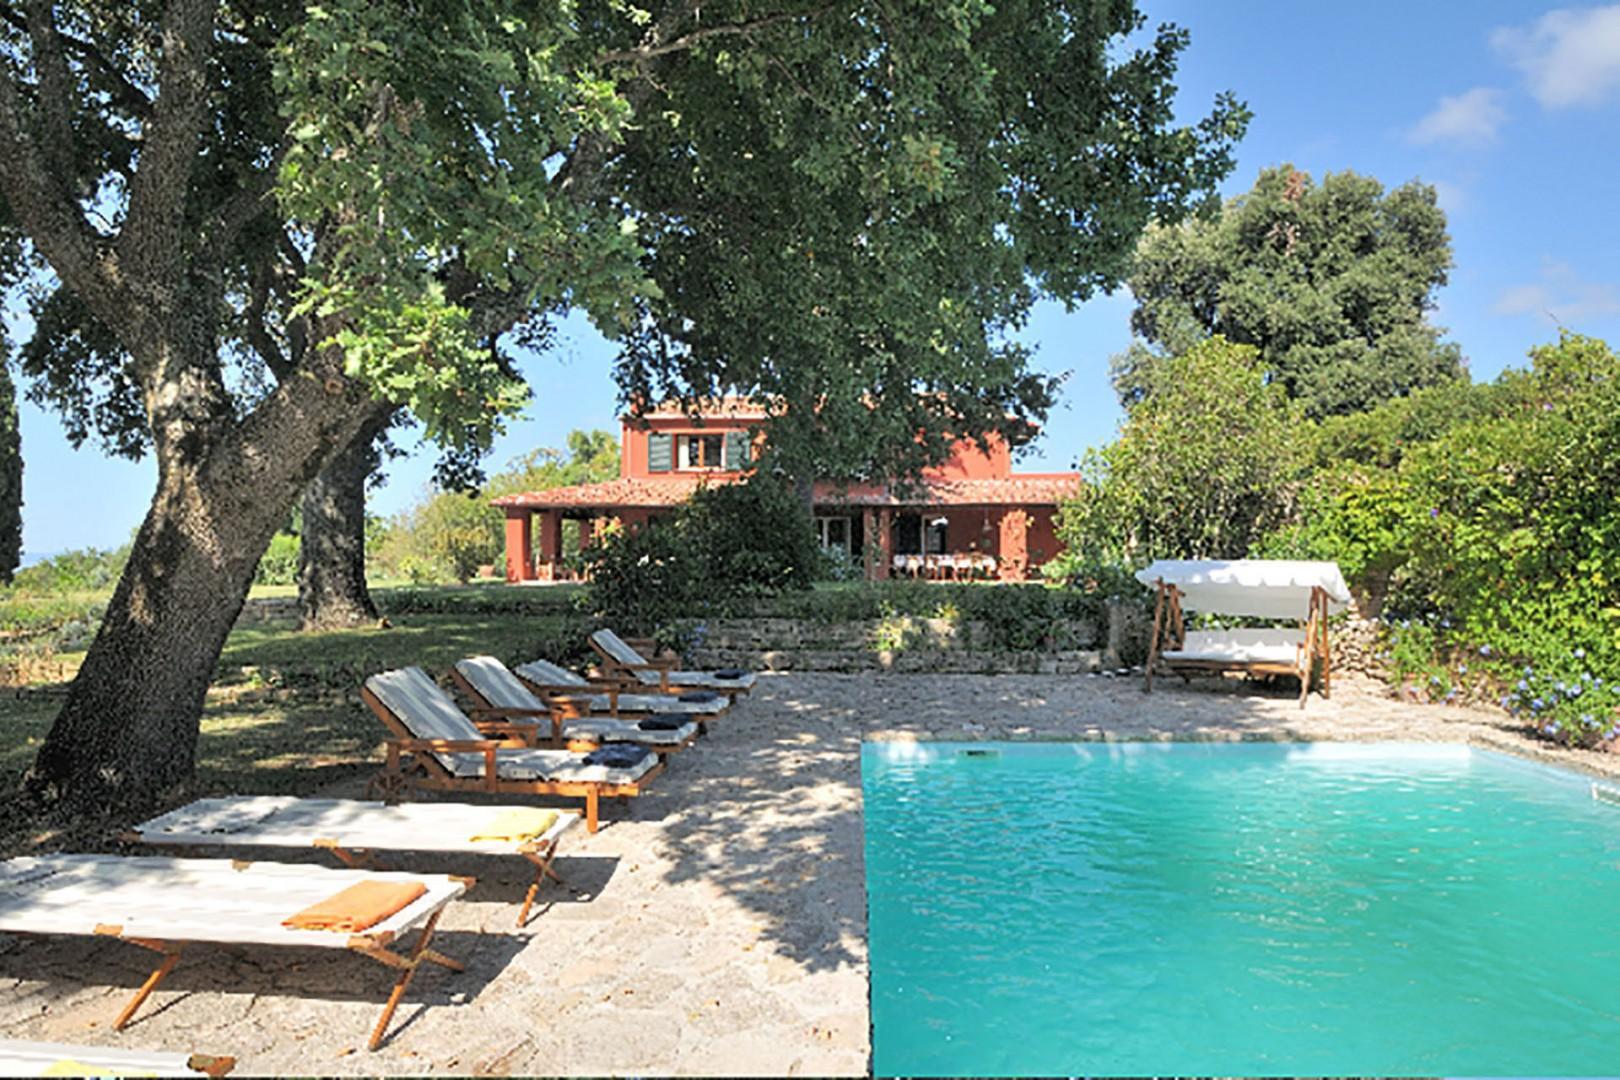 The Colombe villa is in a terrific location for exploring Tuscany's Maremma region near and far.